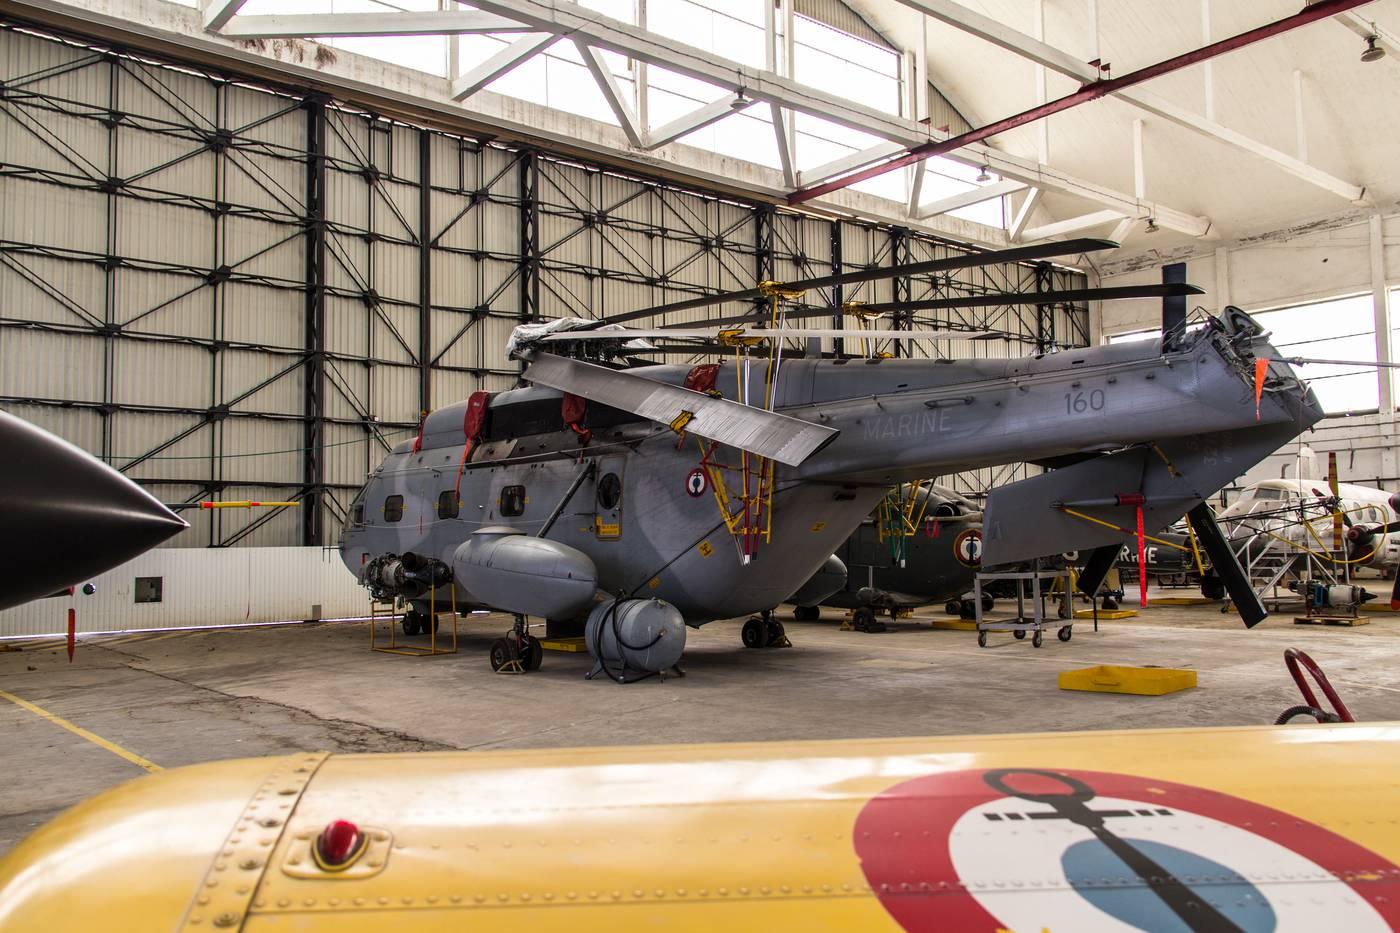 Naam: rochefort-ocean-rochefort-musee-aeronautique-navale2.jpg Bekeken: 350 Grootte: 193,1 KB